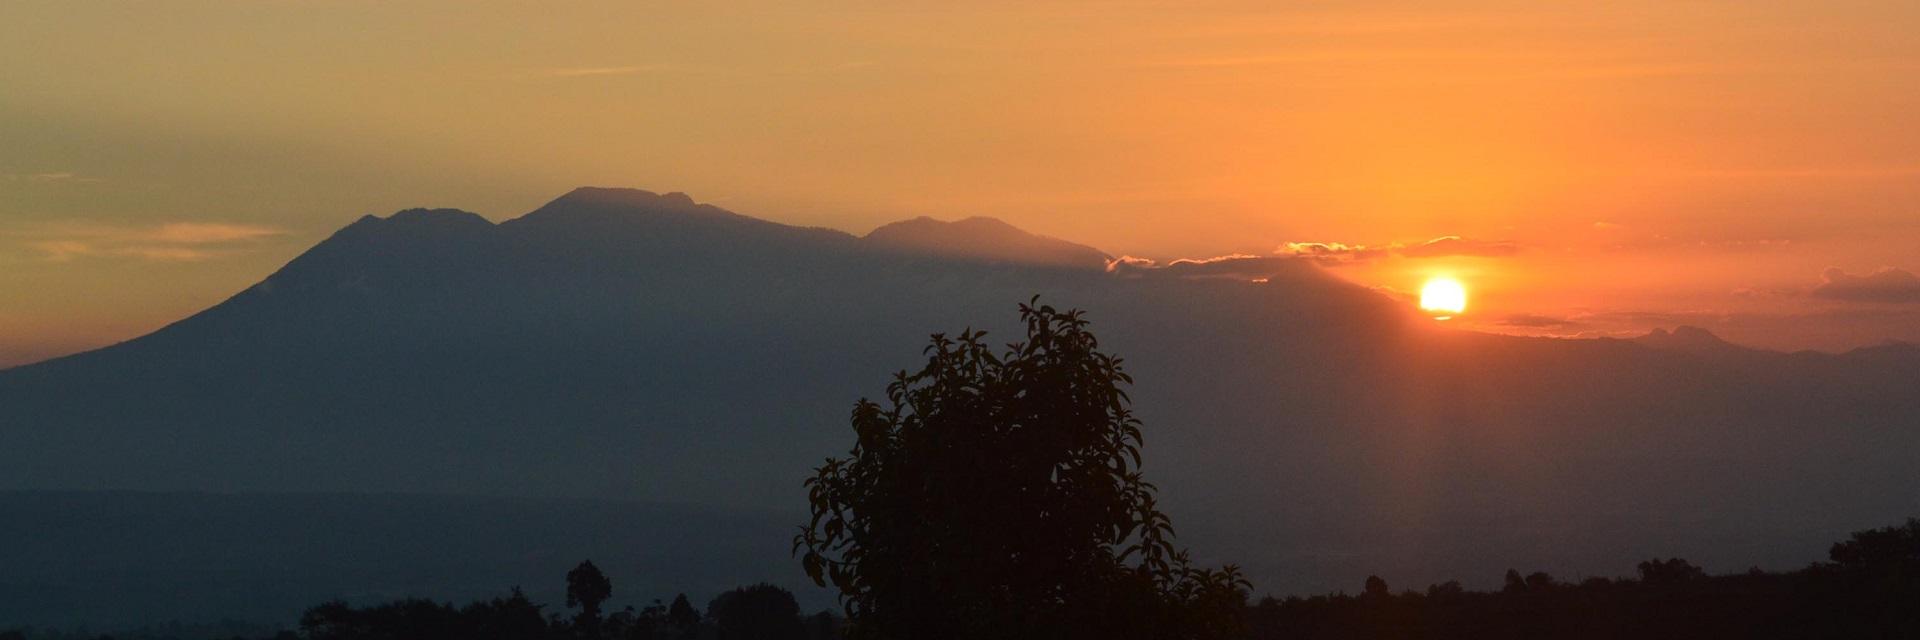 Gunung Sari Sunset Malang via winartie Gunung Sari Sunset Malang via winartie - Dolan Dolen